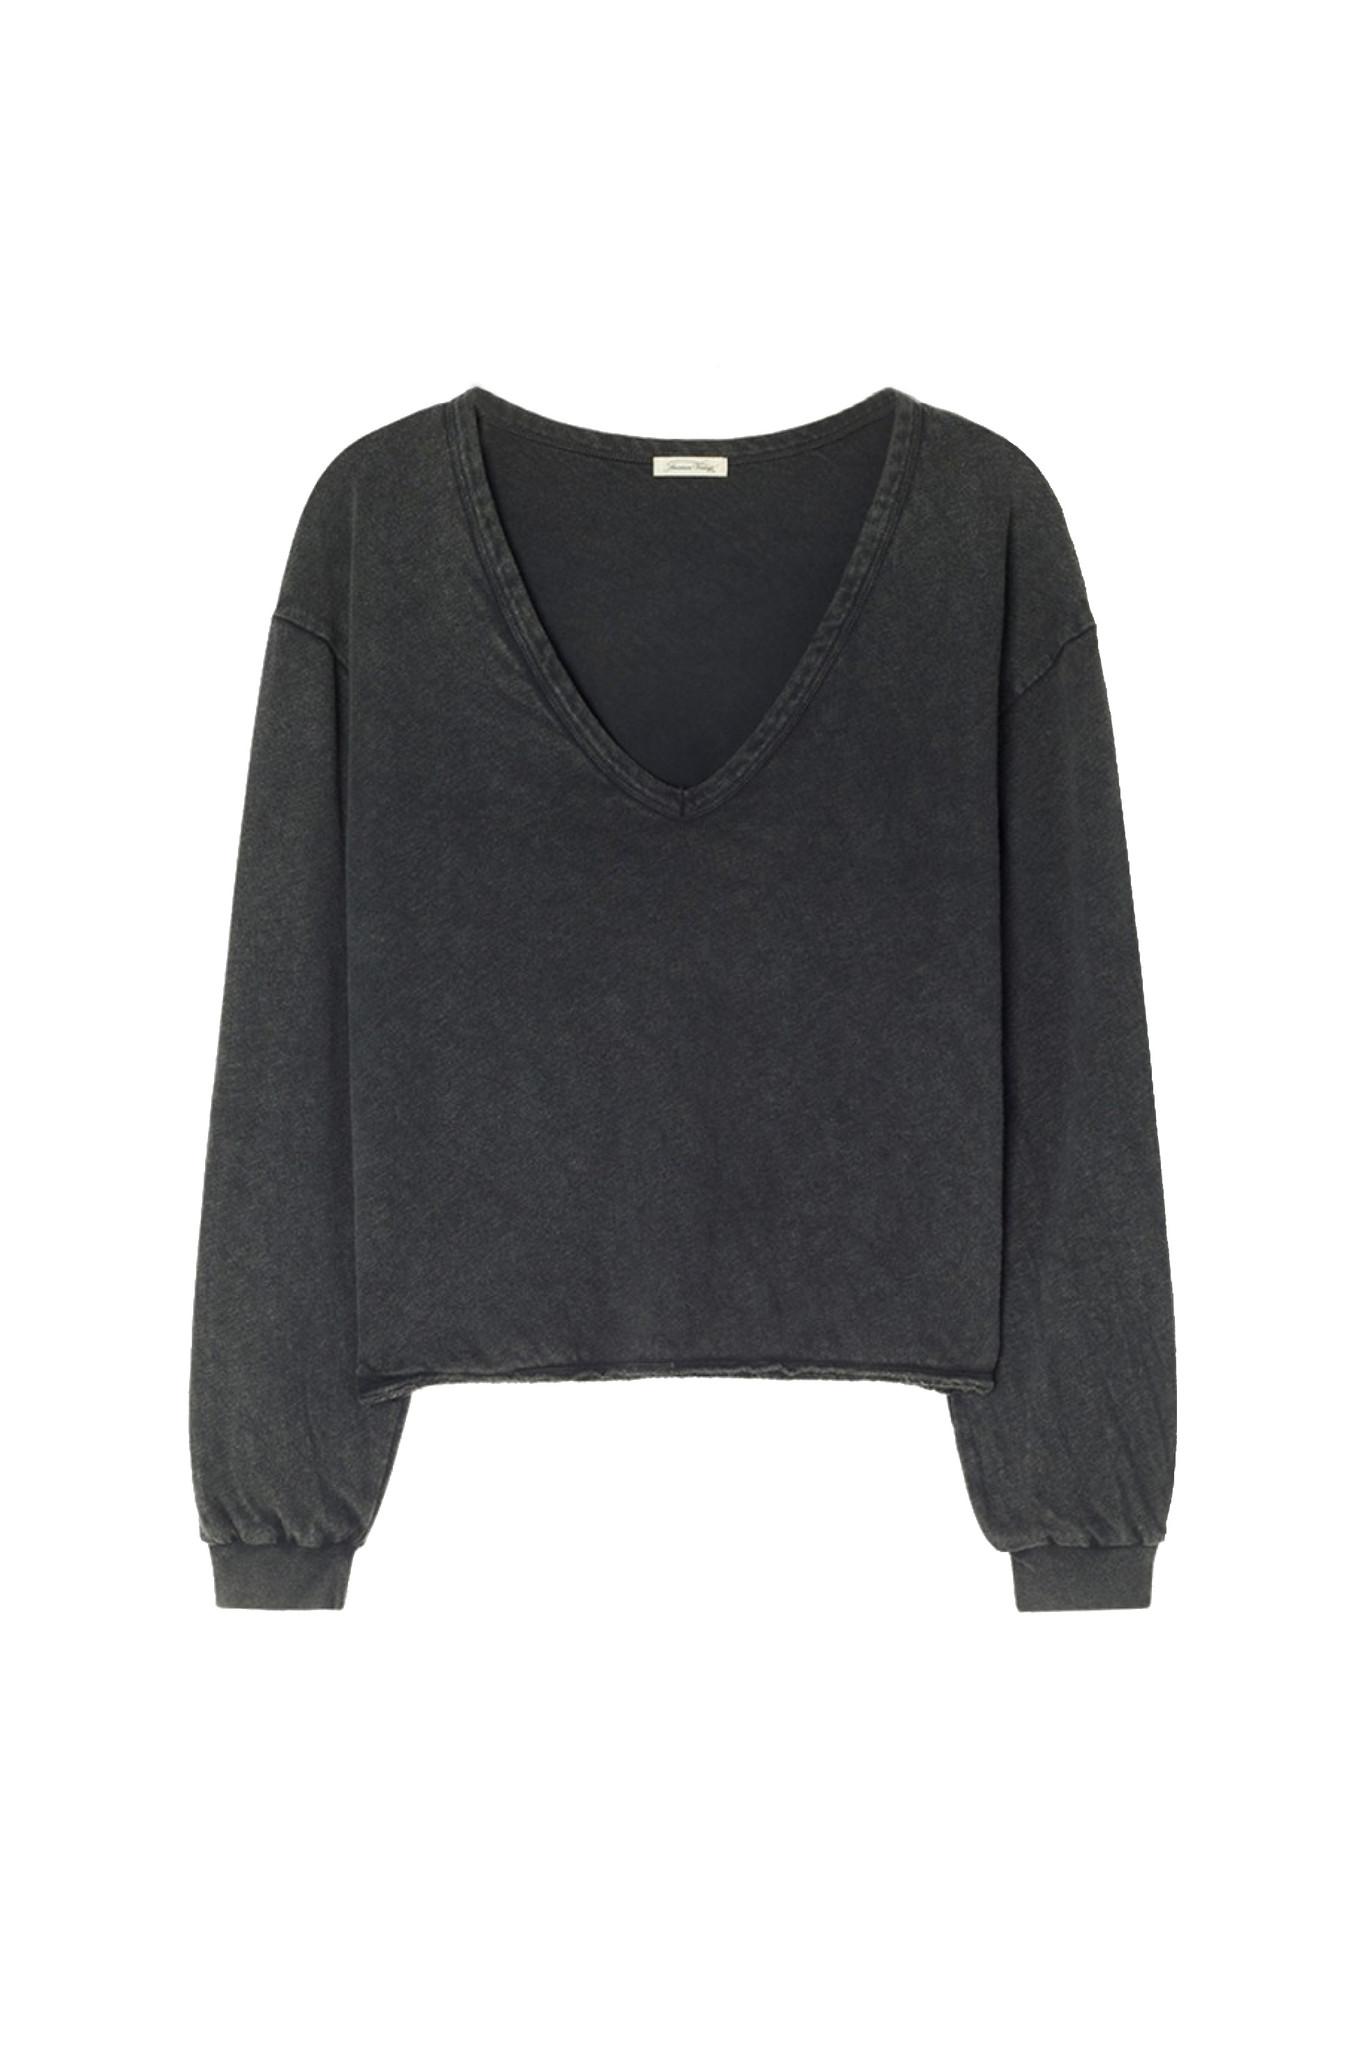 Sonoma Shirt - Vintage Black-1